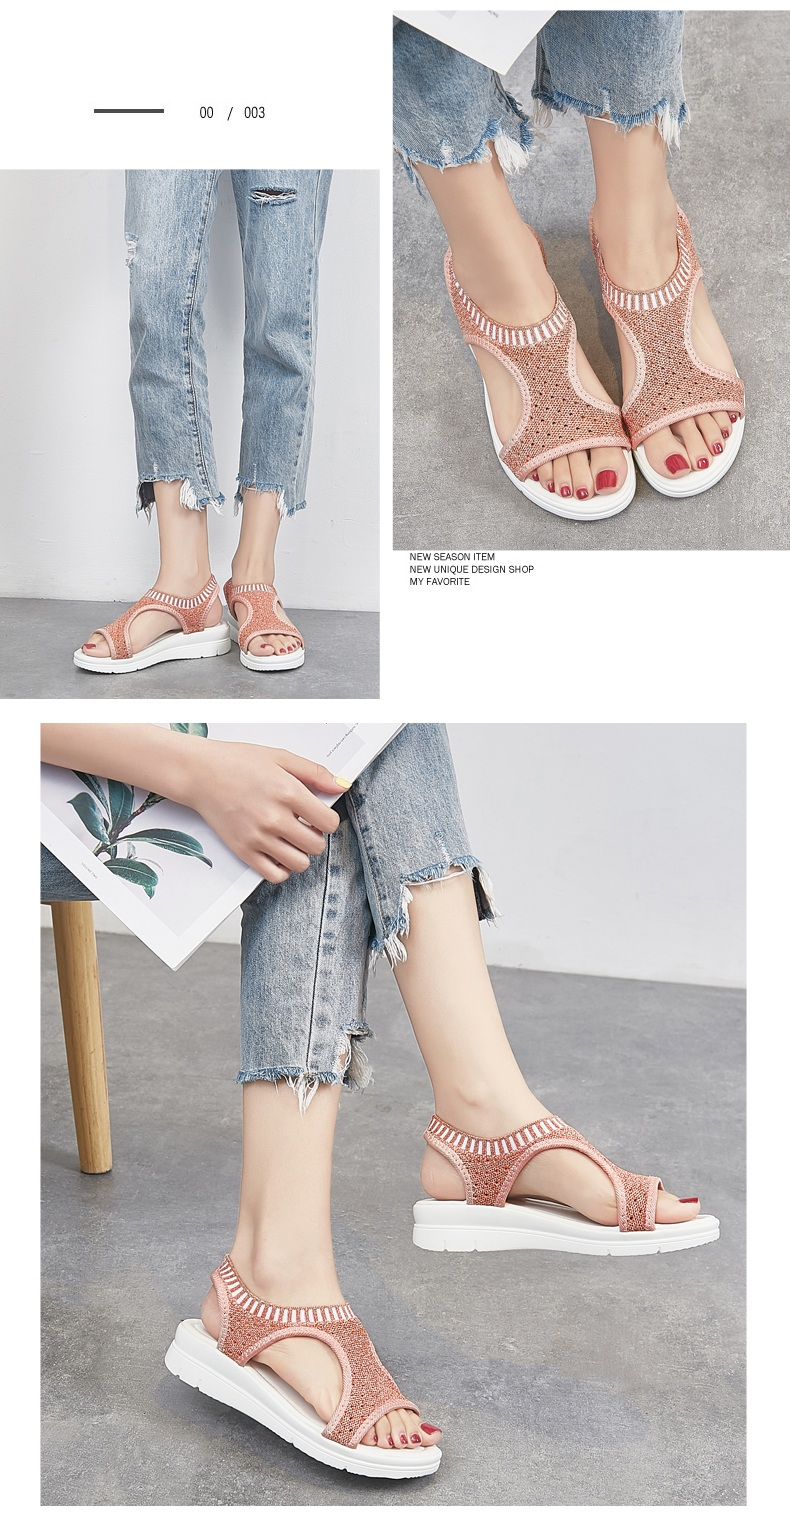 Hdb40d0c855764b839dc694e0cc132415p WDZKN 2019 Sandals Women Summer Shoes Peep Toe Casual Flat Sandals Ladies Breathable Air Mesh Women Platform Sandals Sandalias